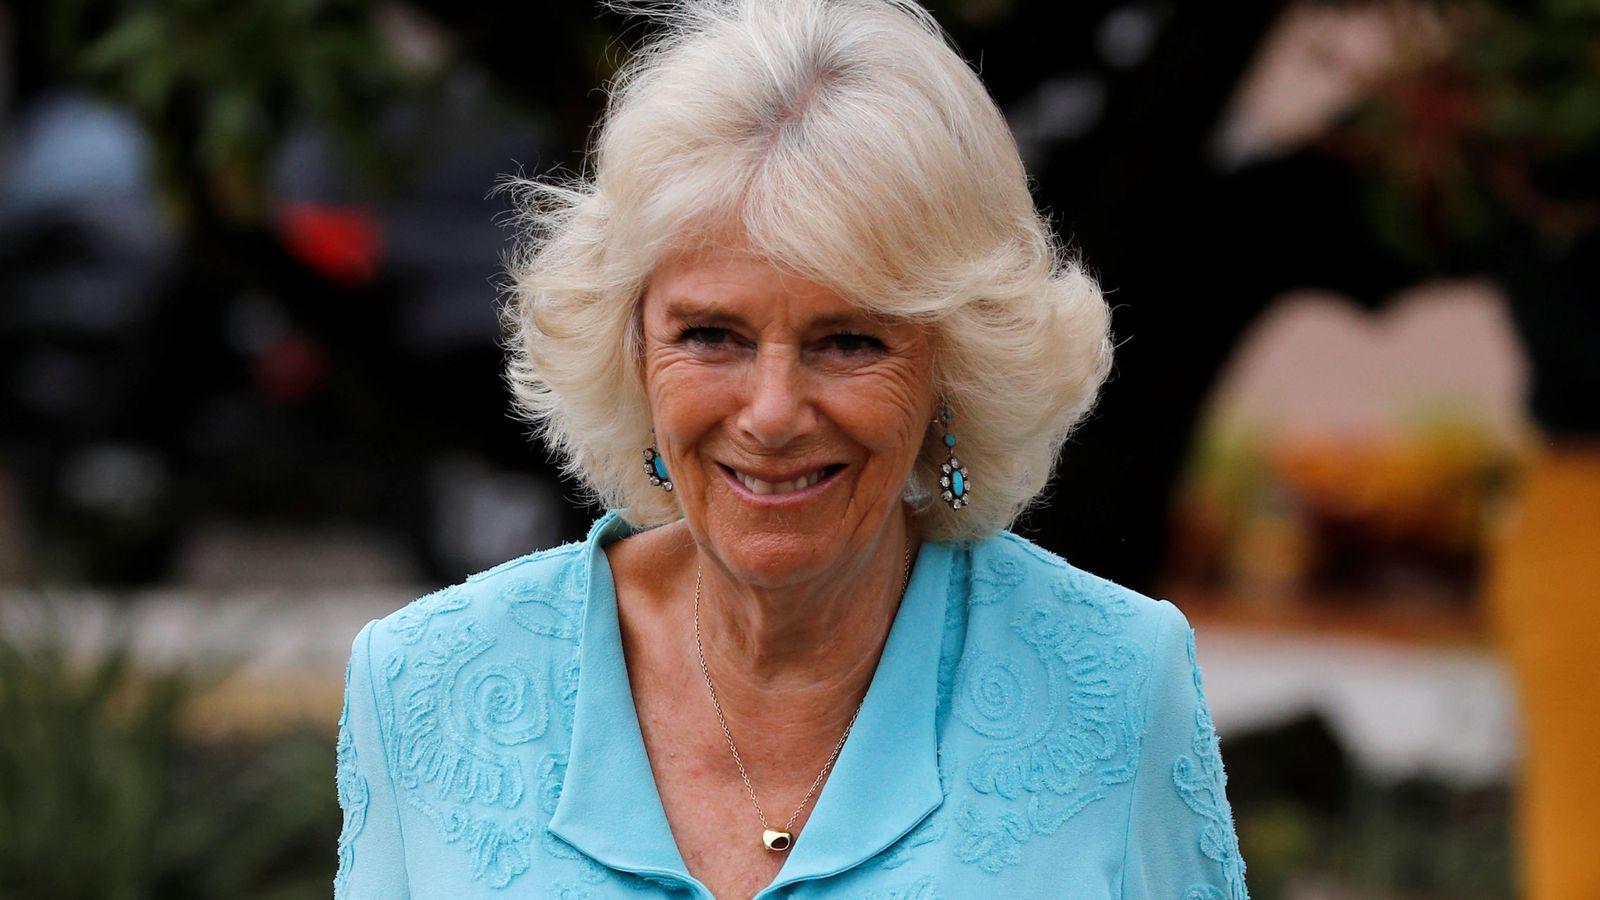 Foto: Camilla, duquesa de Cornualles, en una imagen de archivo. (Reuters)